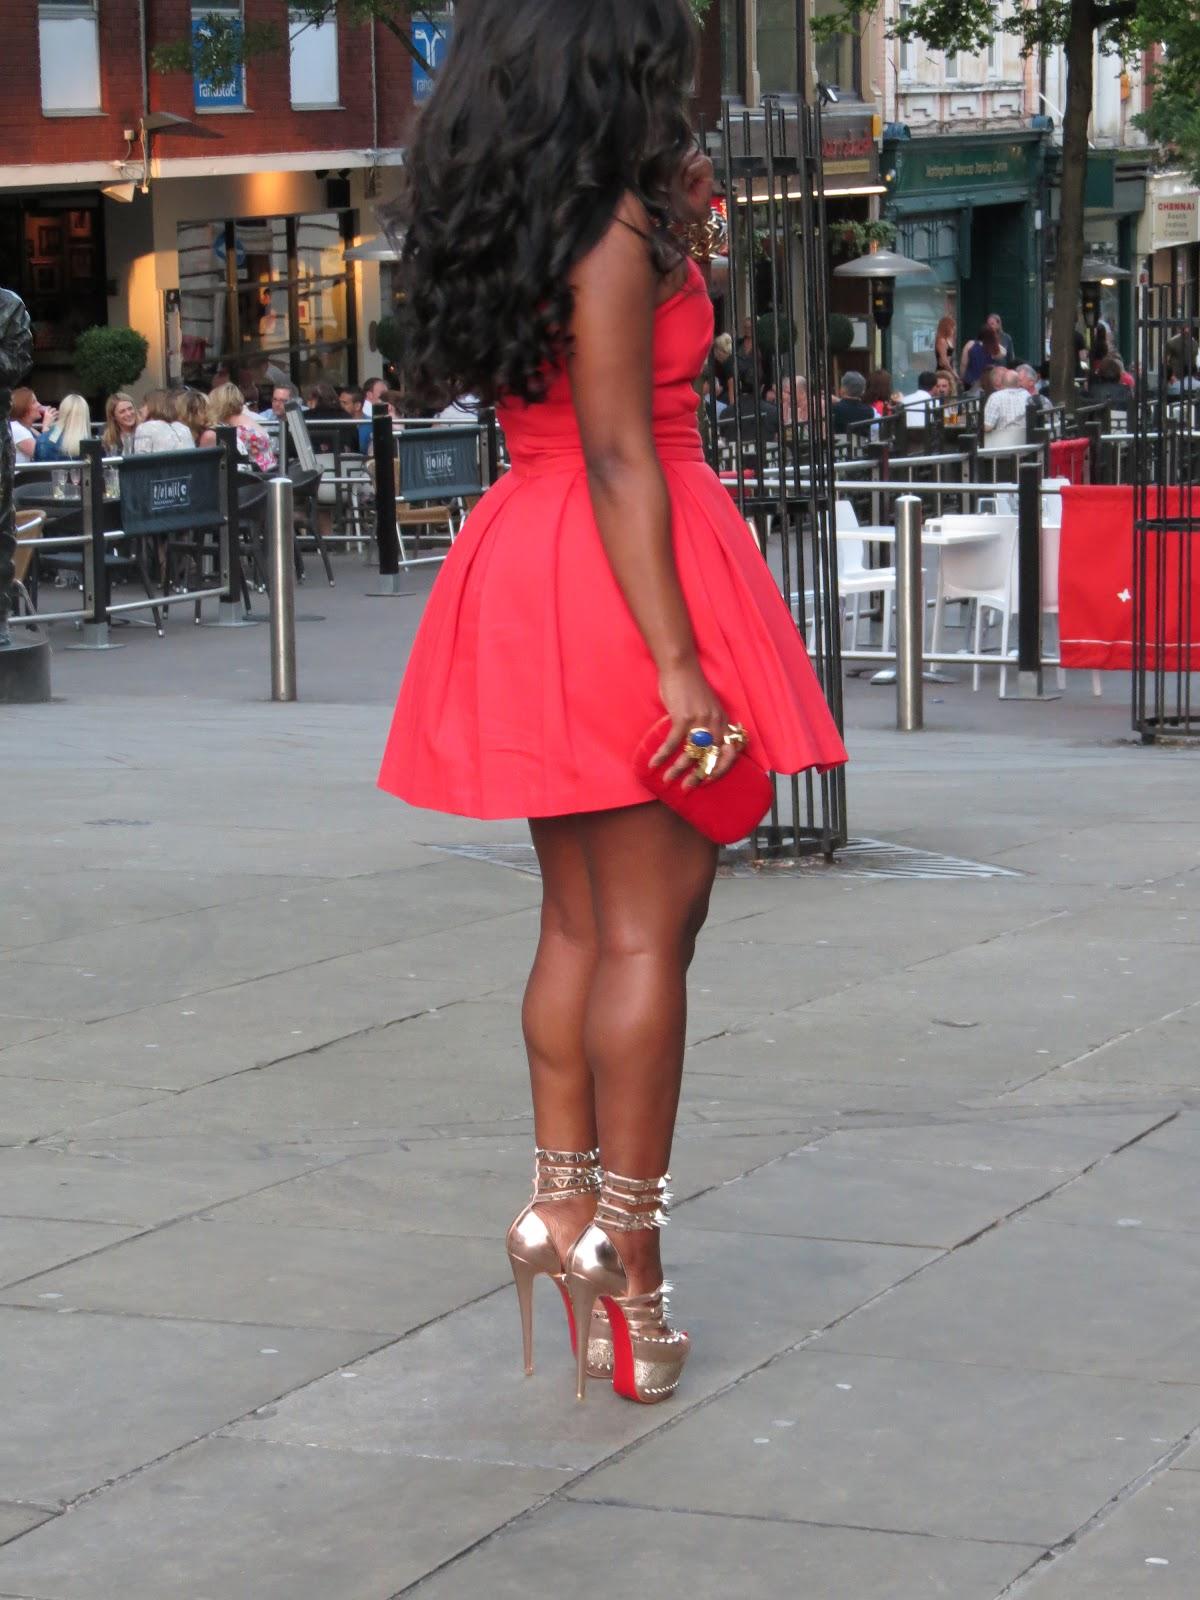 Фото девушка на каблуках фото сзади